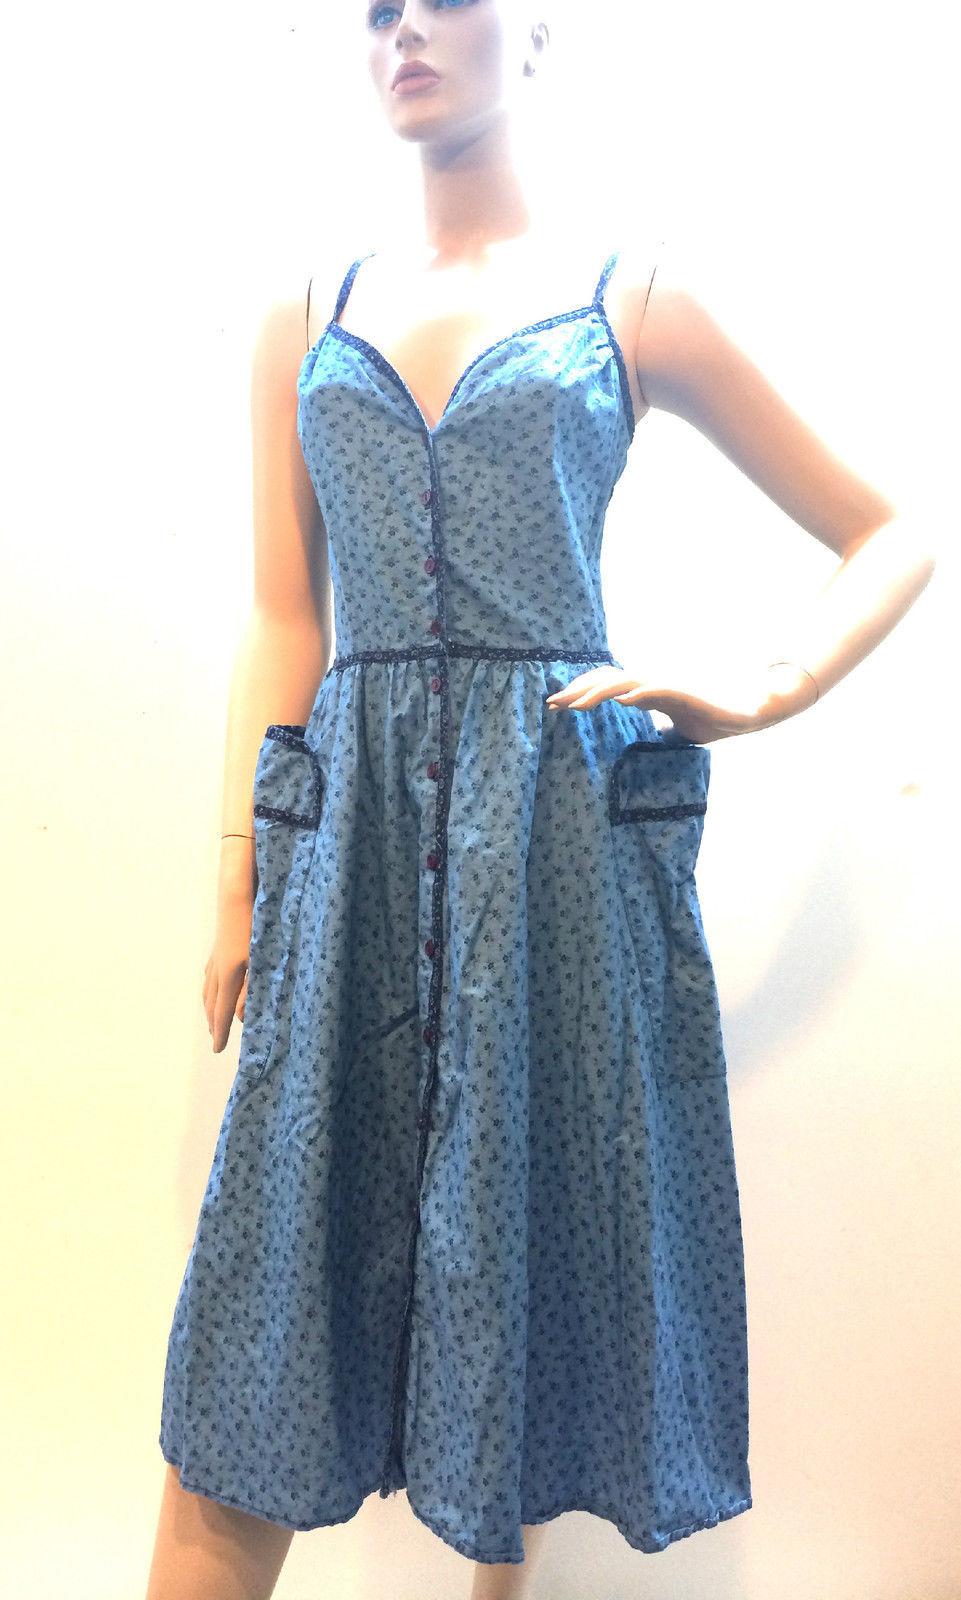 Gunne Sax Jessica Mcclintock Dress: 14 listings